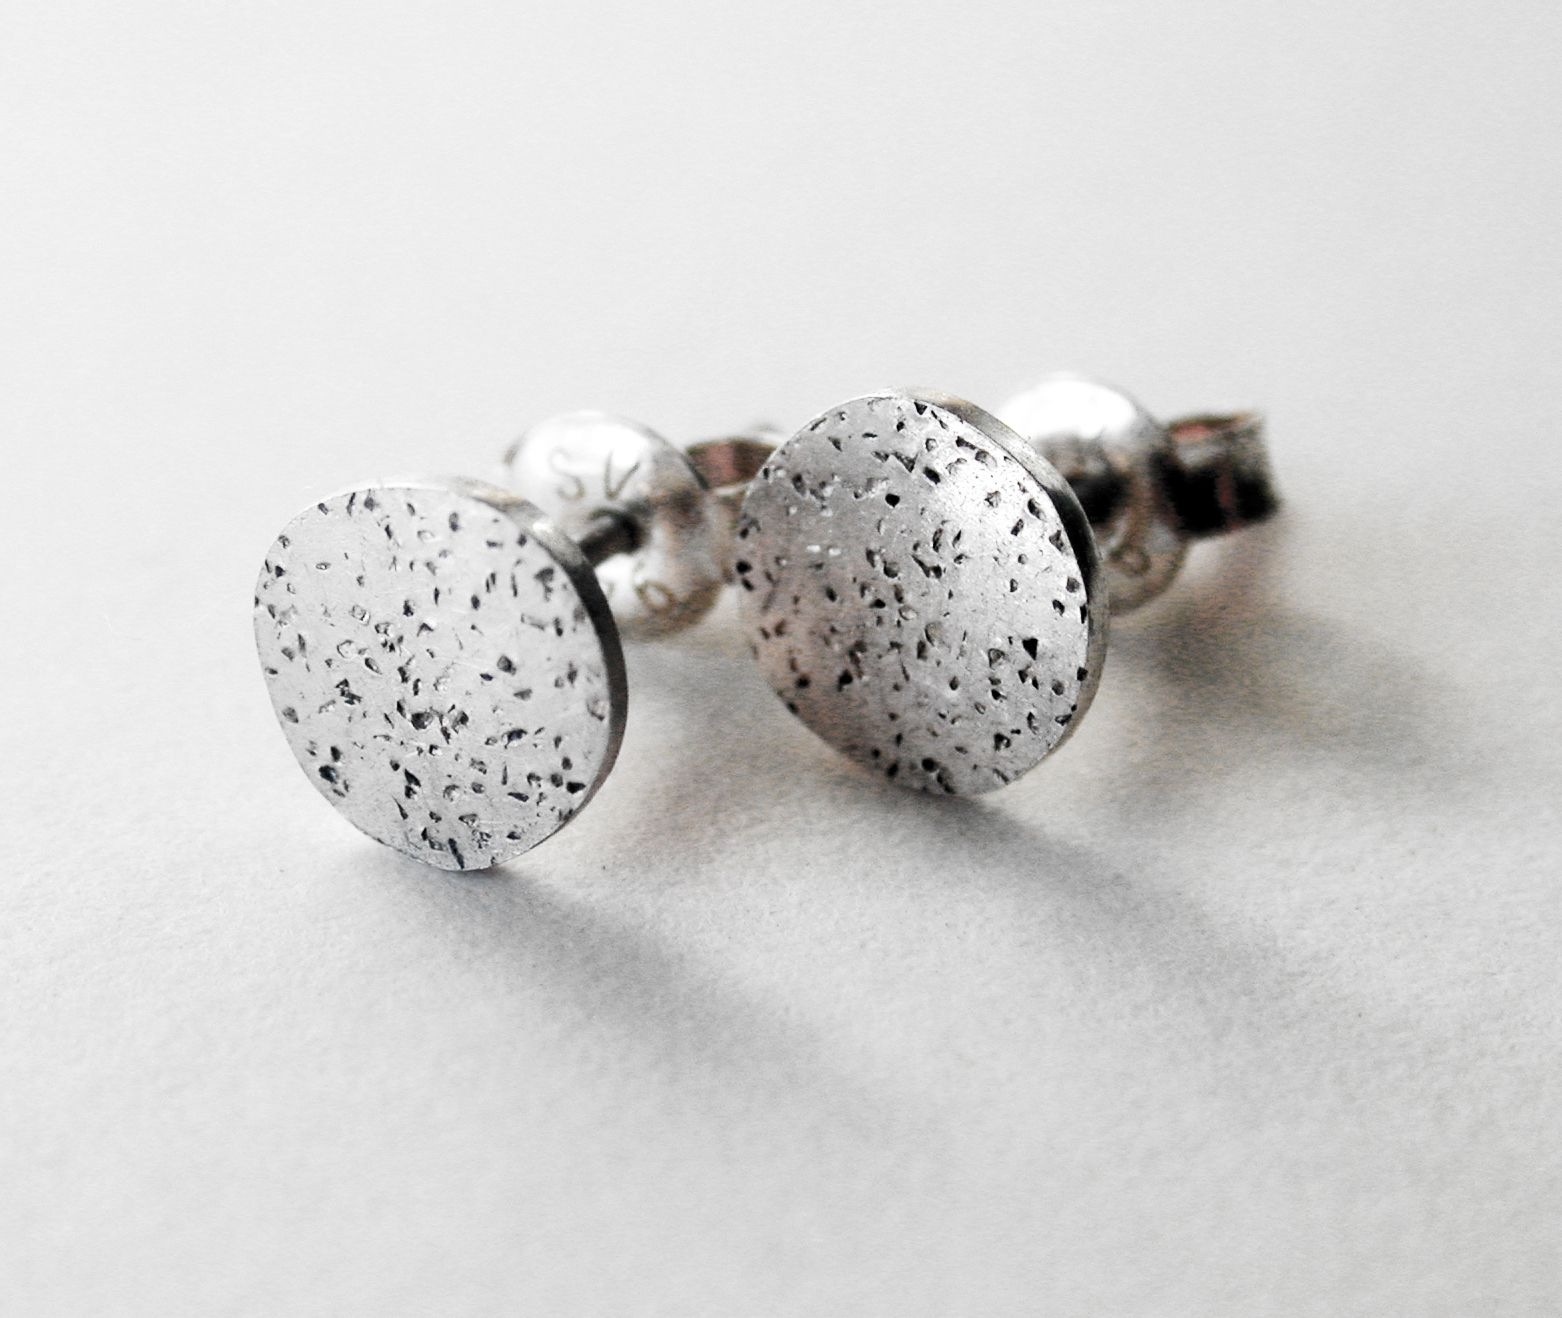 Silver textured stud earrings.  Handmade by Reshma Tia Champaneria jewellery.